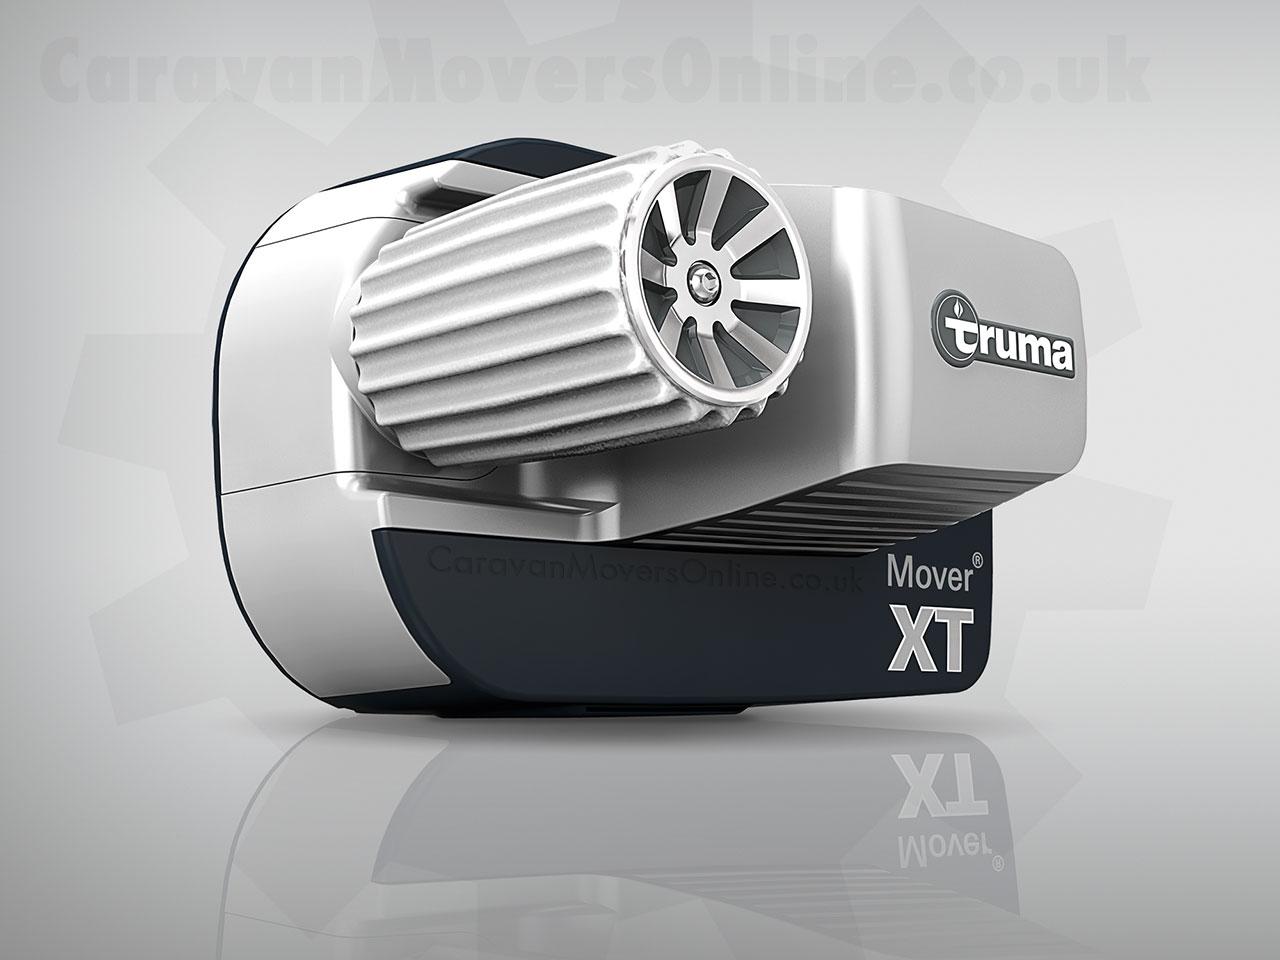 Truma caravan movers the caravan mover the trumove s trumove t truma mover xt asfbconference2016 Choice Image